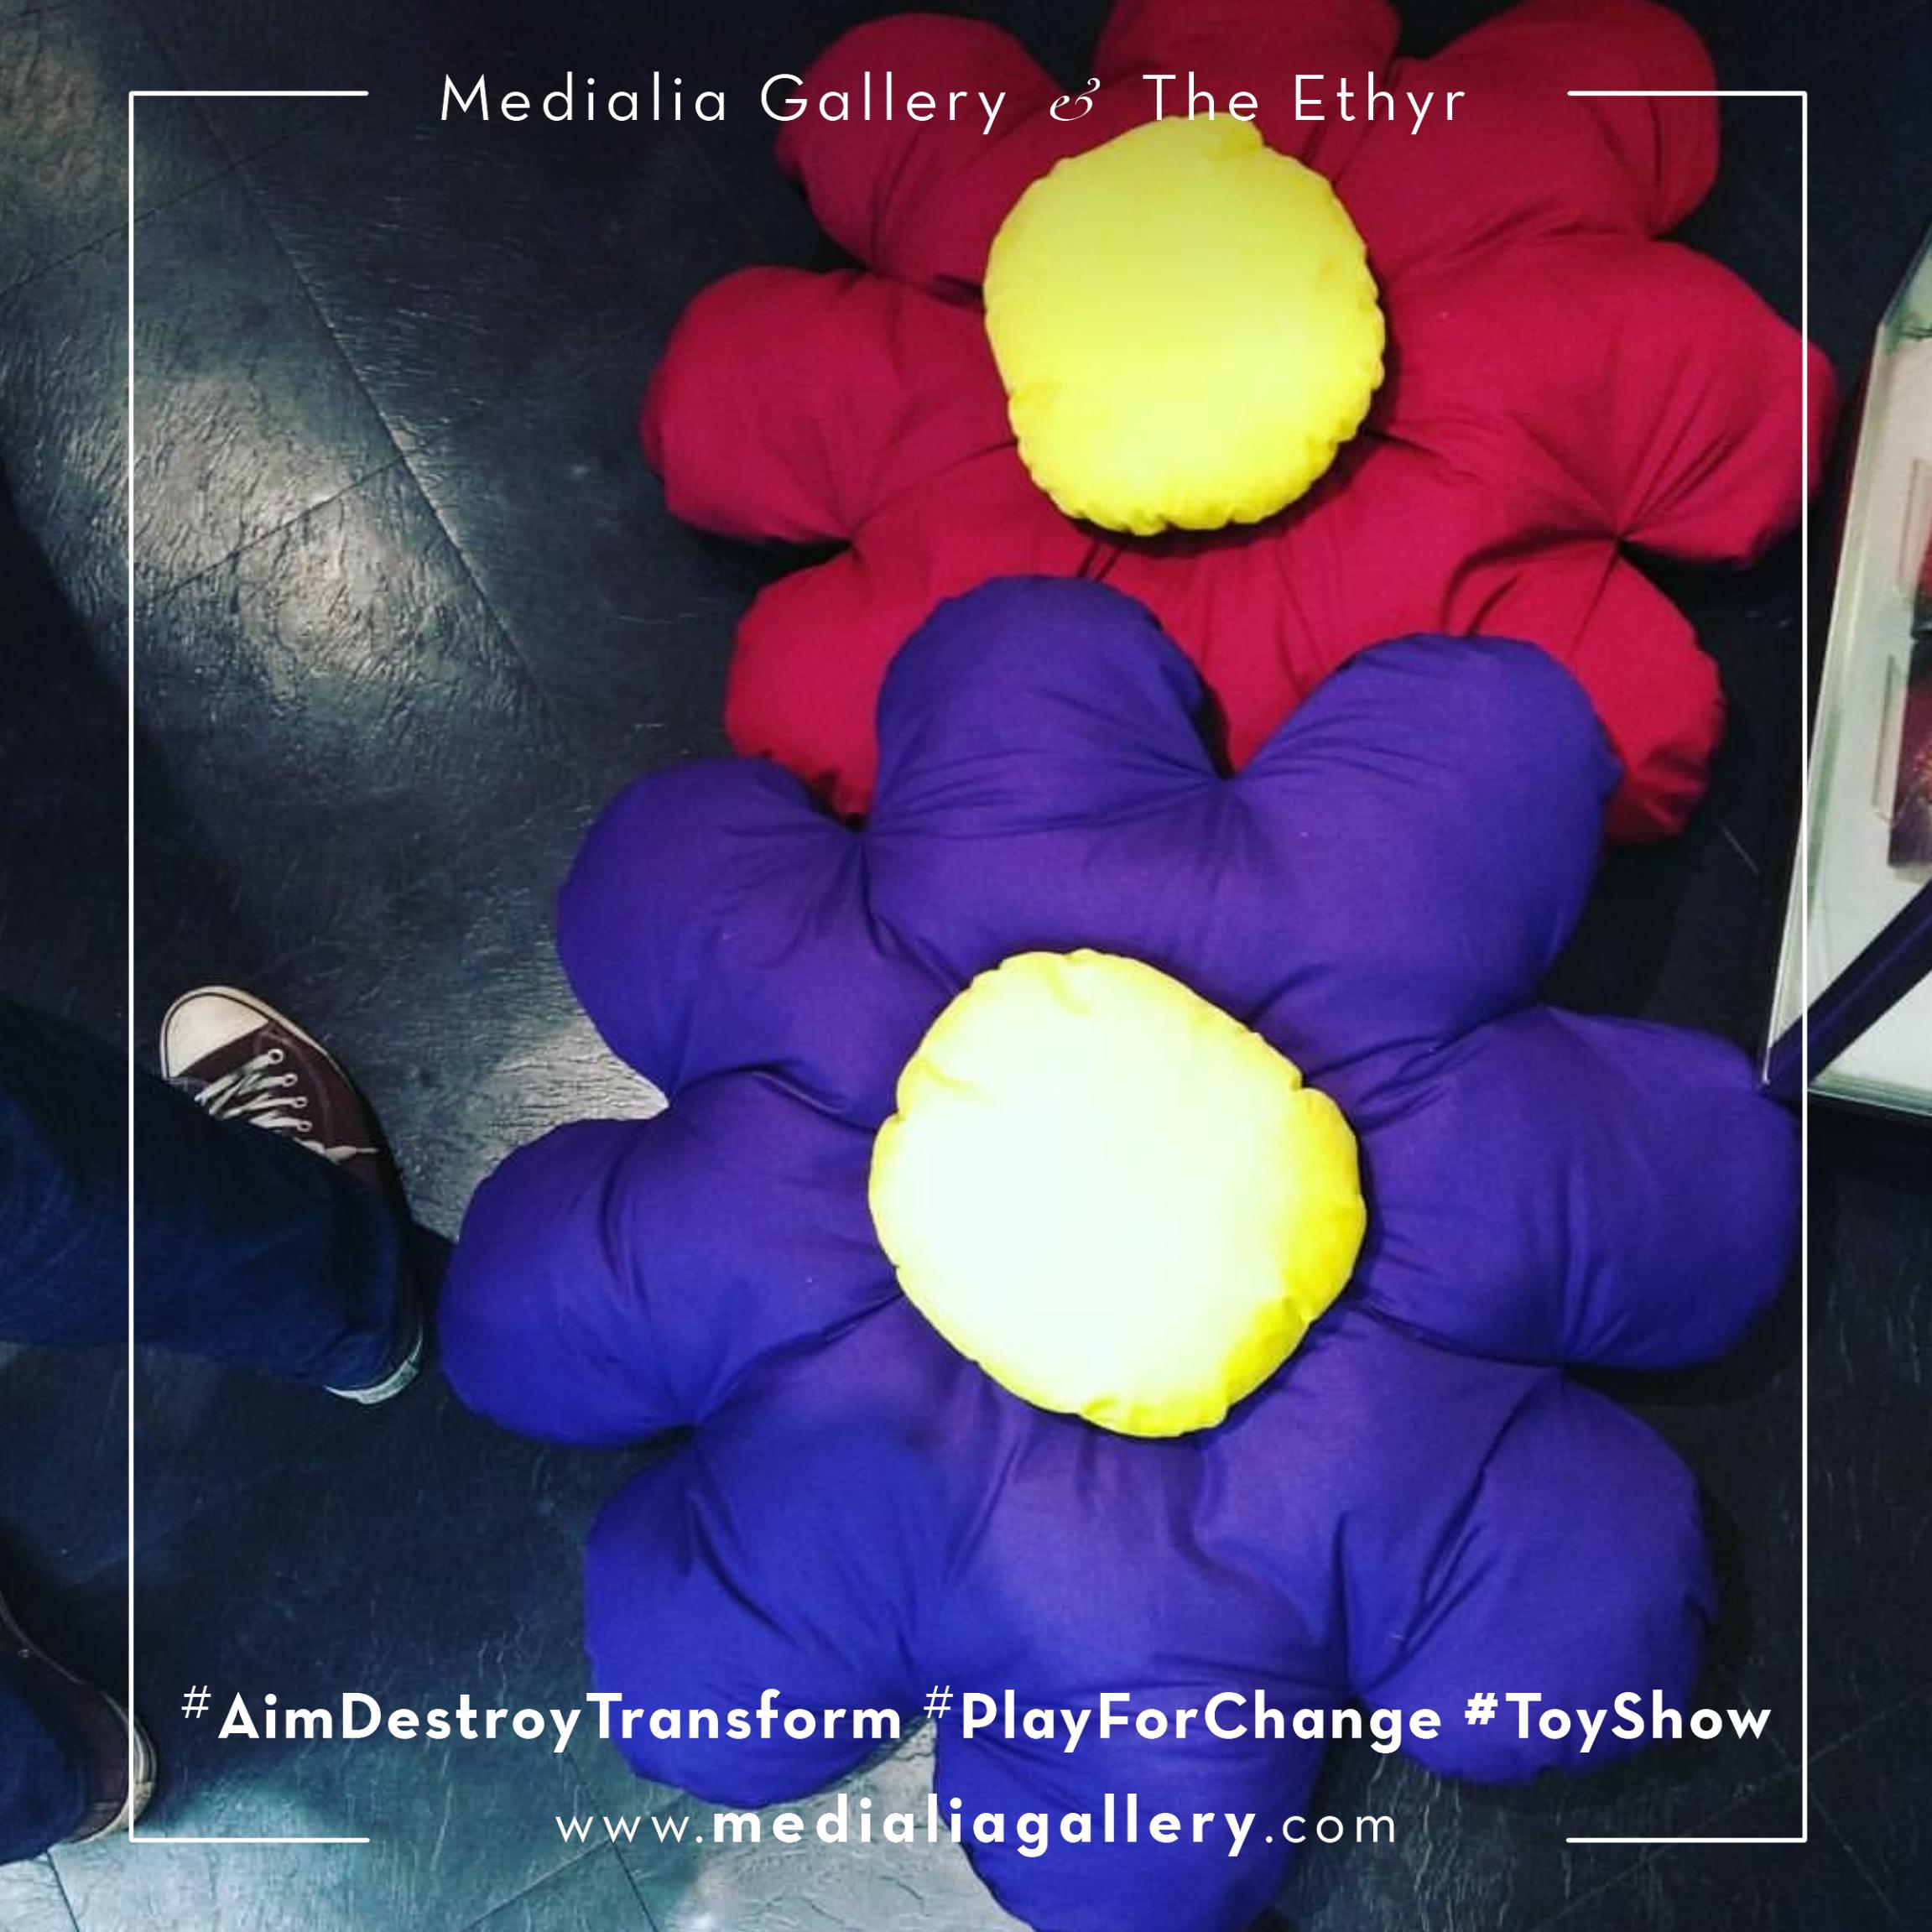 MedialiaGallery_The_Ethyr_AimDestroyTransform_Toy_flowers_November_2017.png